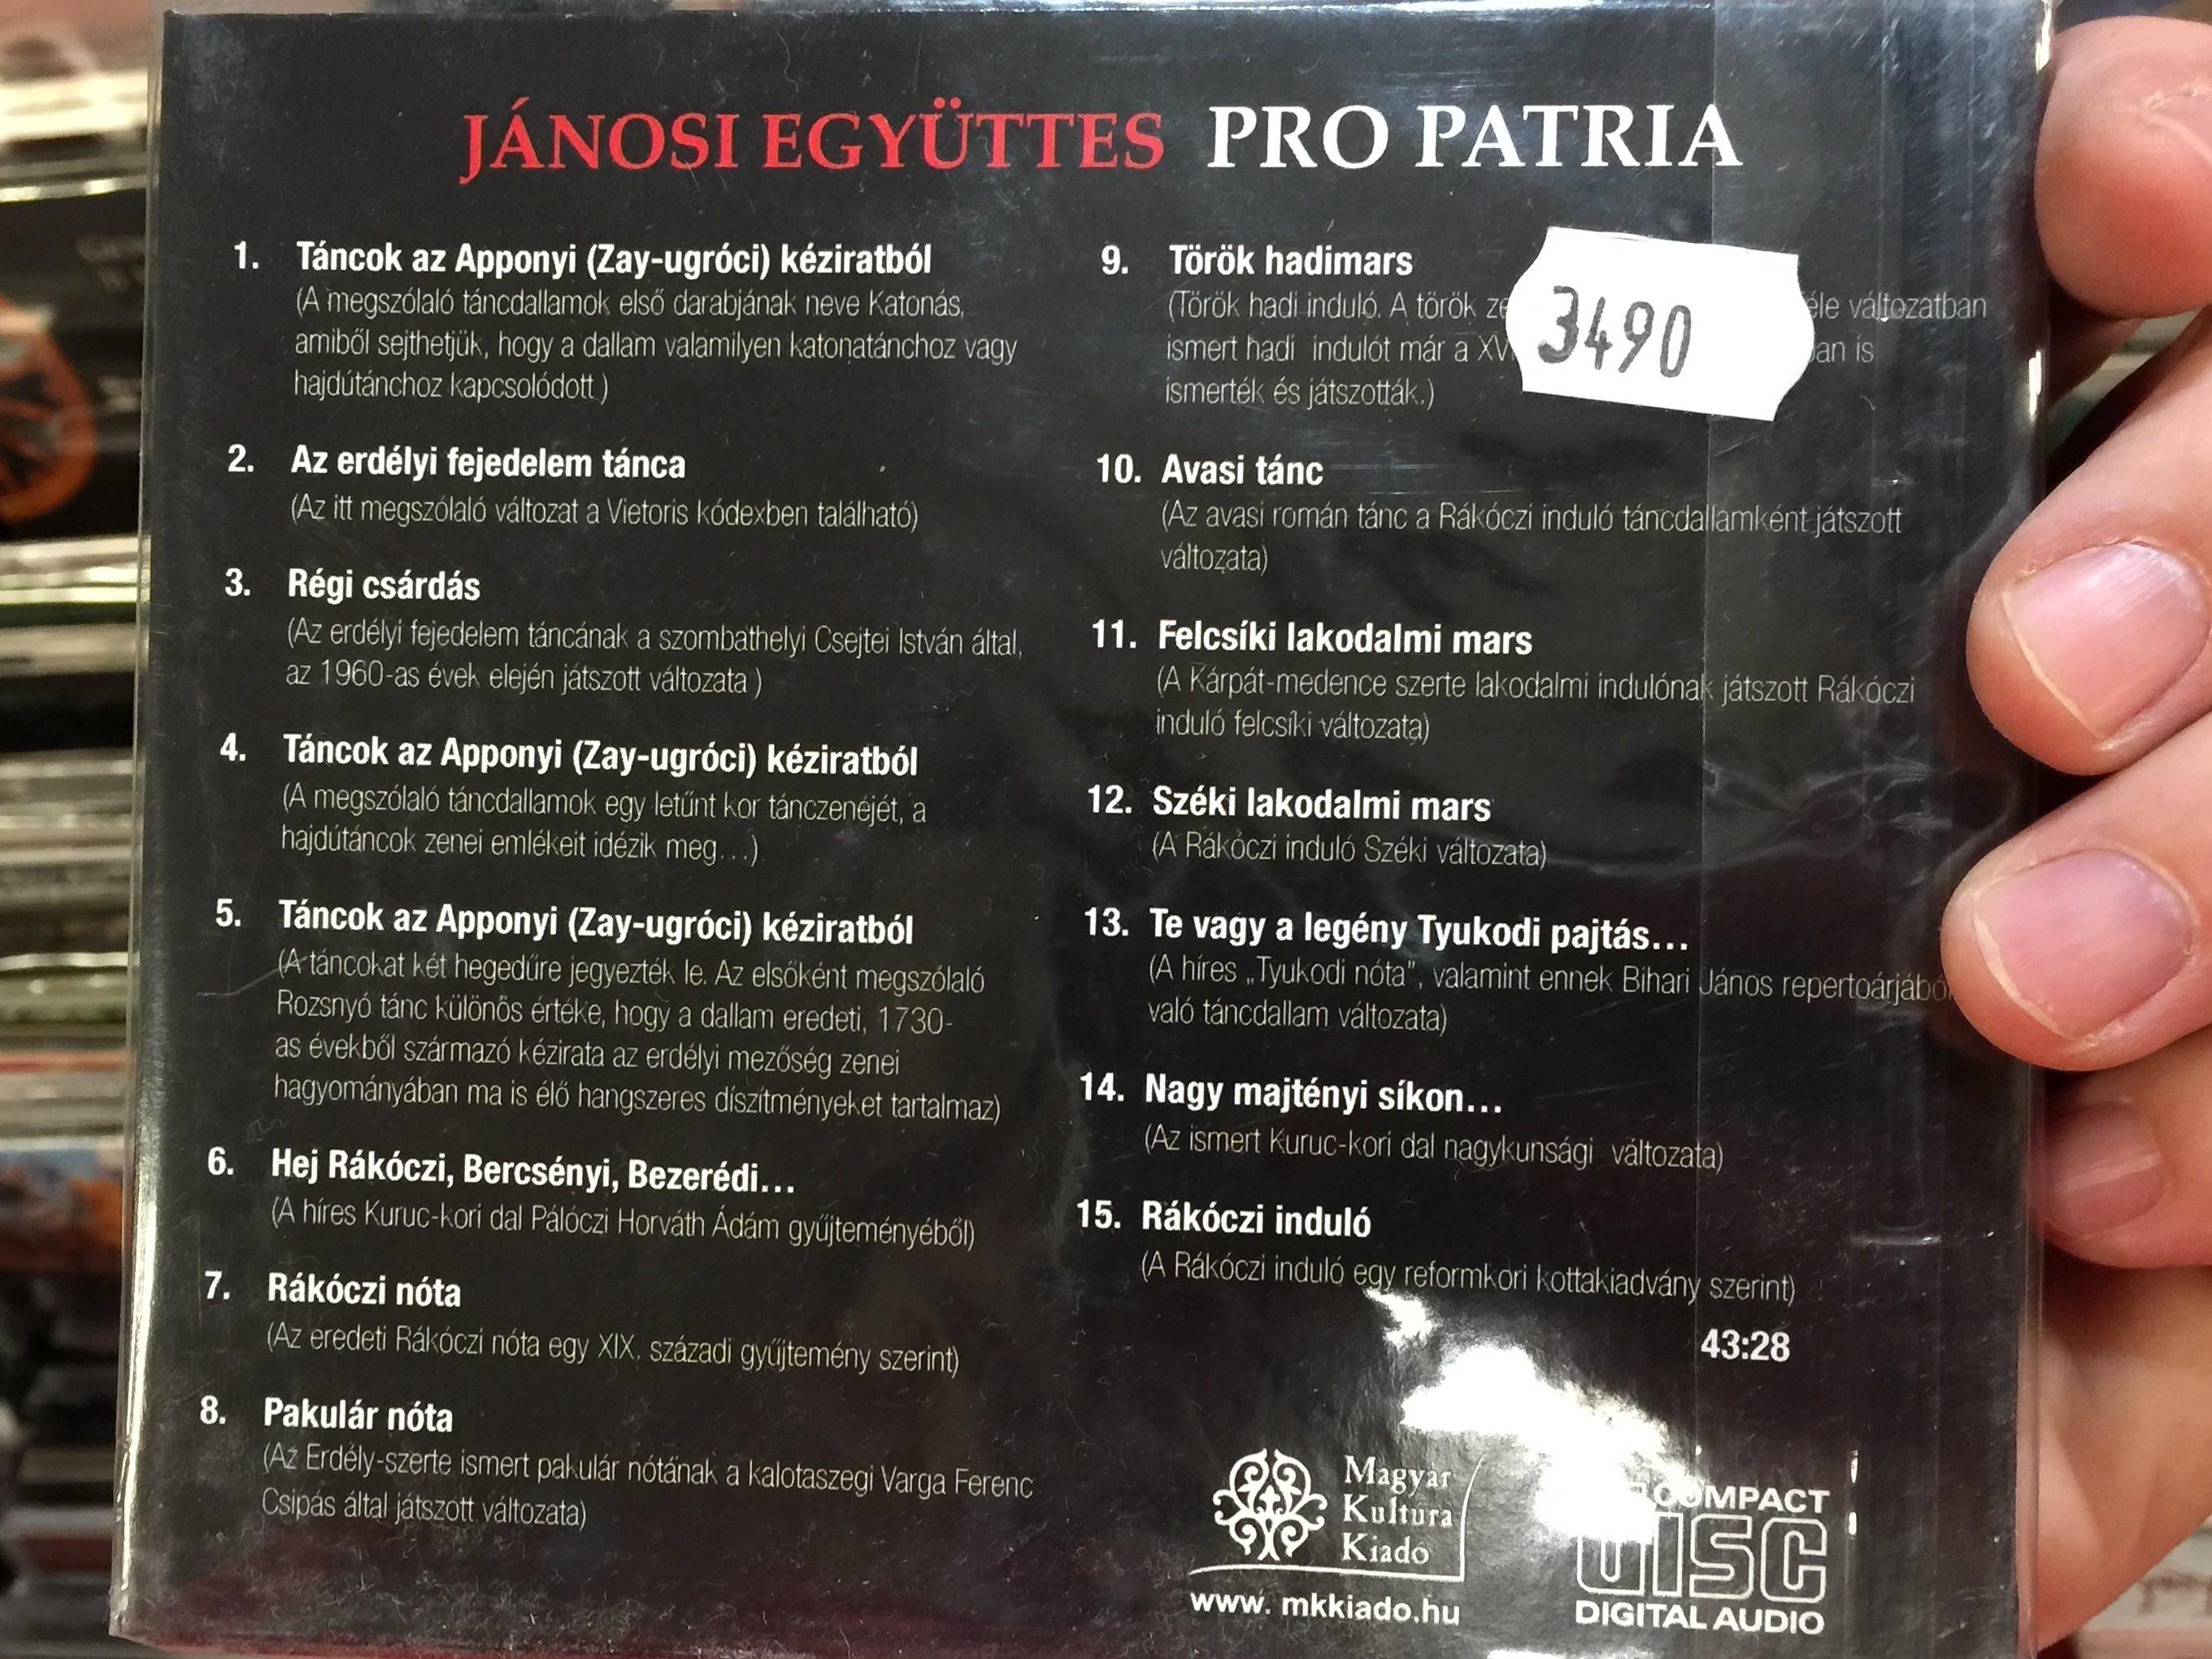 janosi-egyuttes-pro-patria-magyar-kultura-kiado-audio-cd-2-.jpg